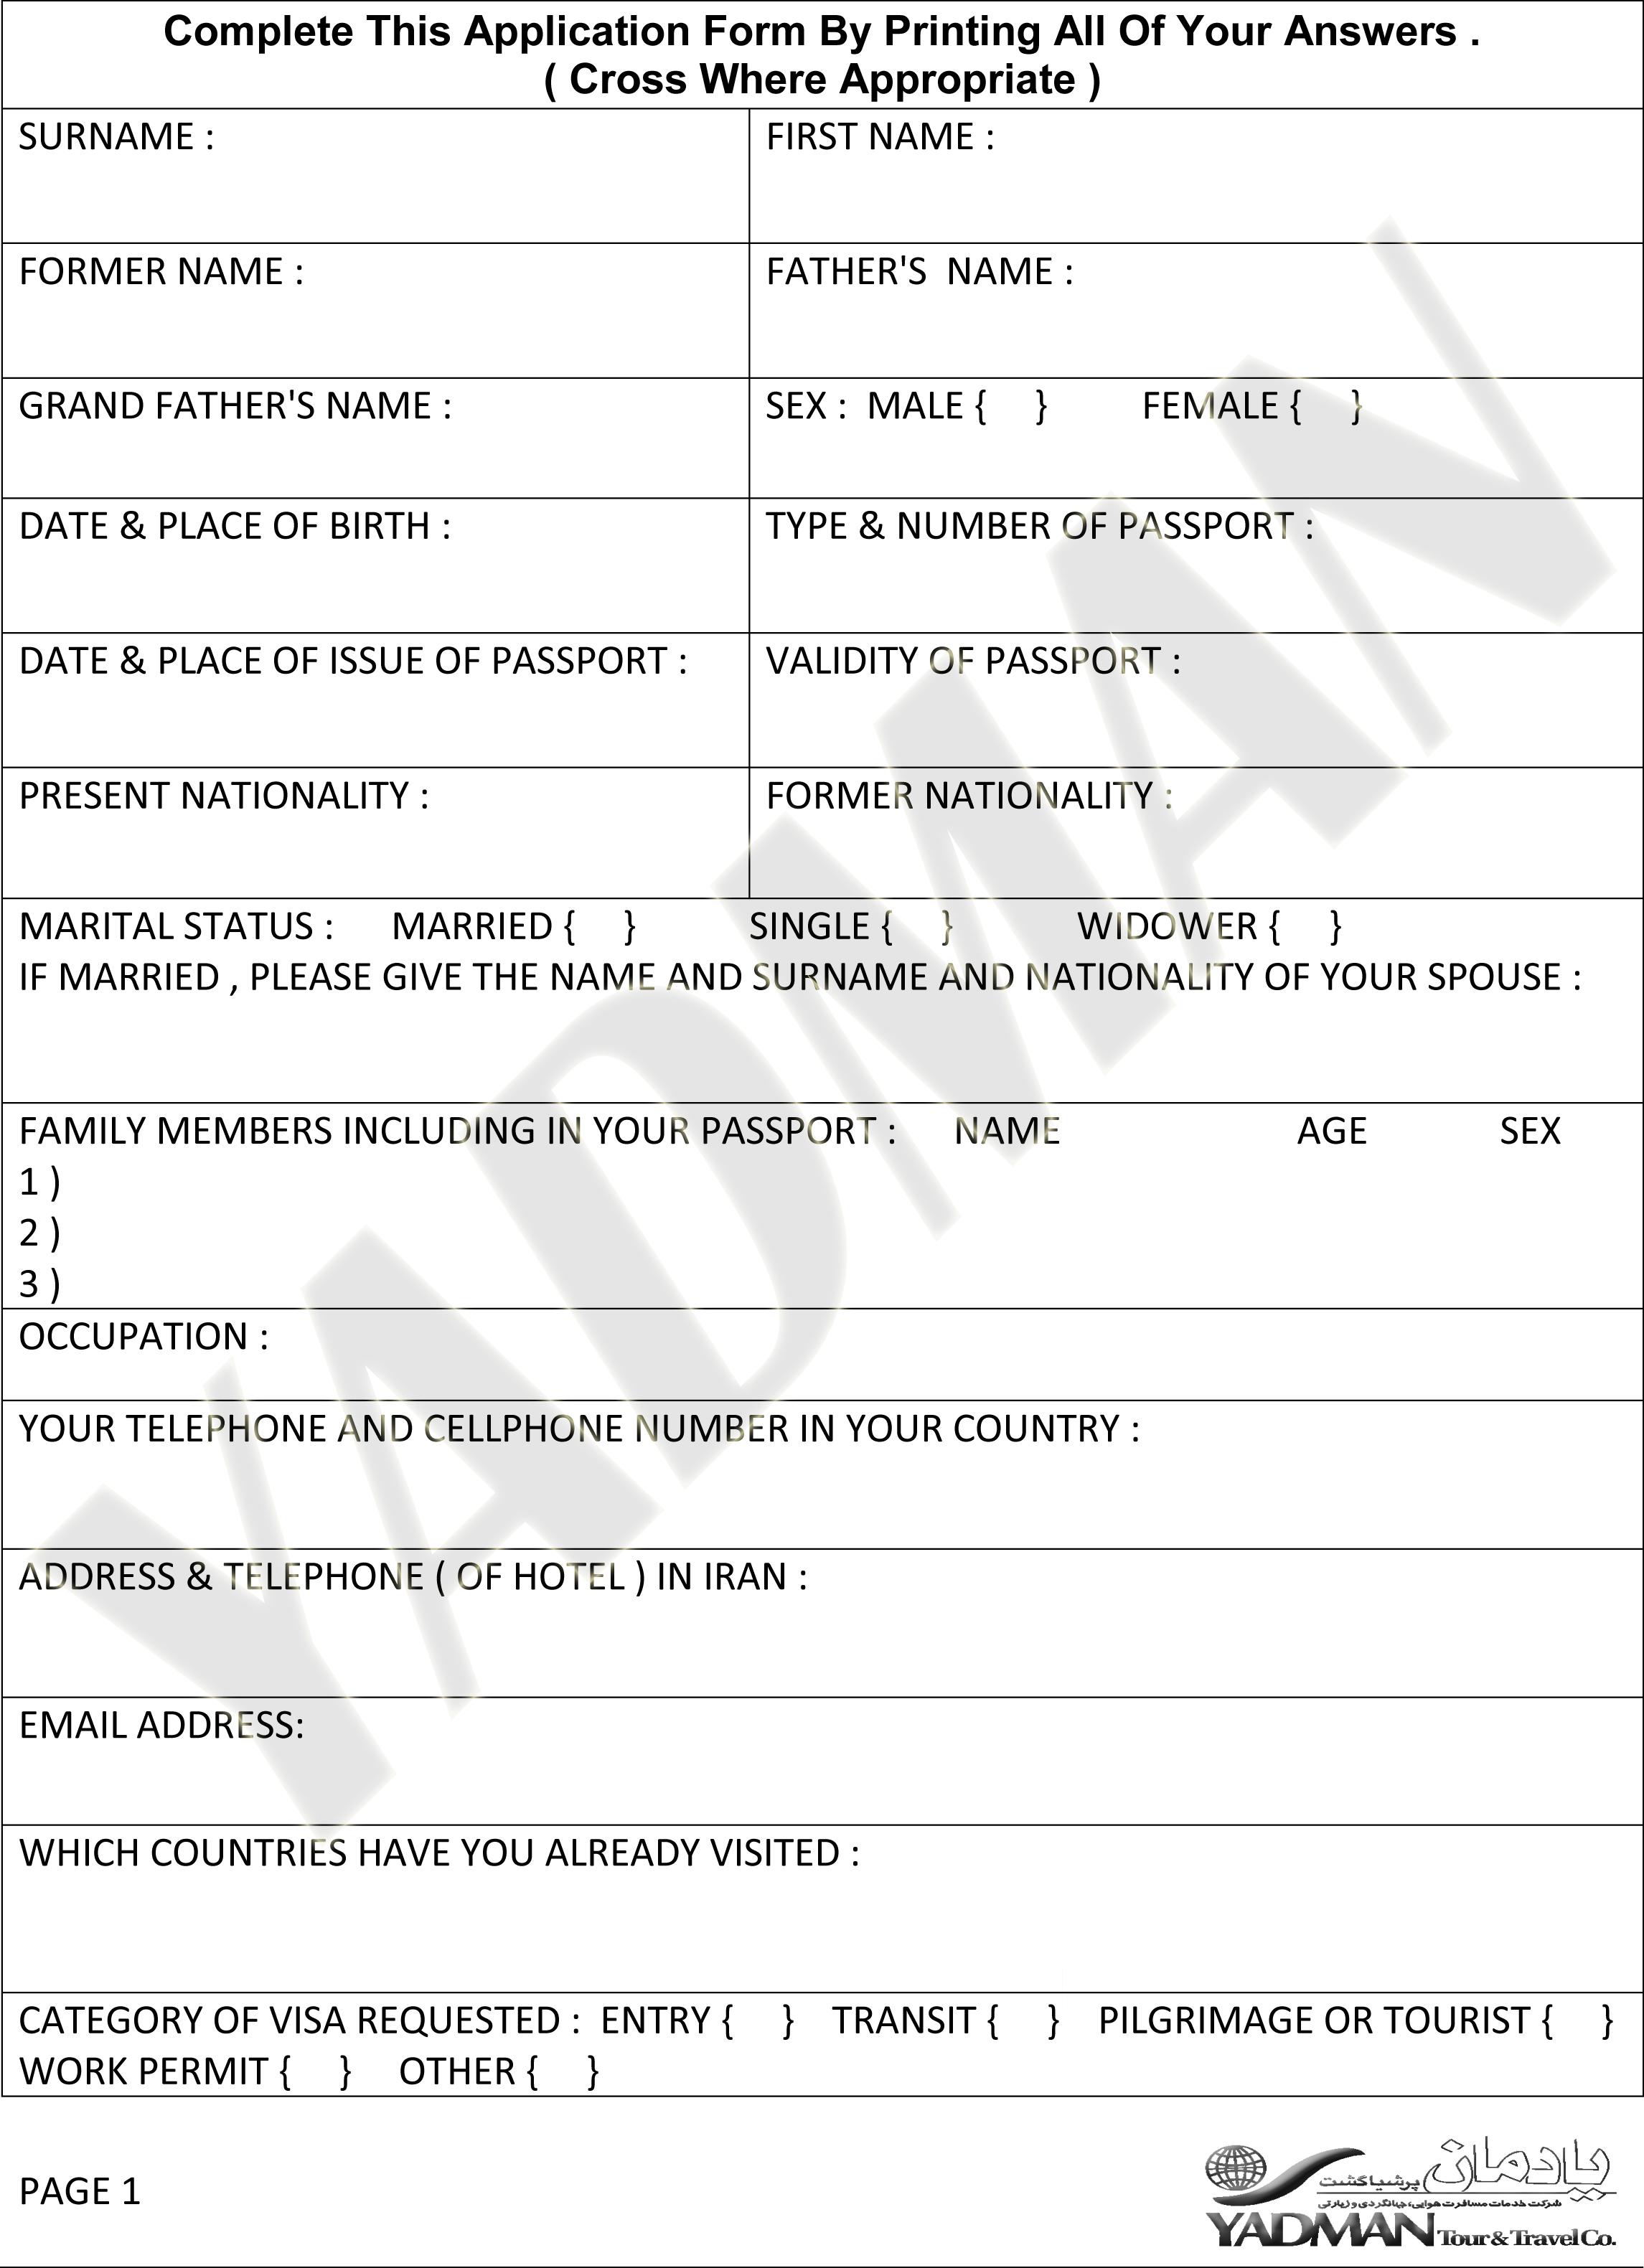 Yadman-Iran-Visa-Application-Form Iran Visa Application Form For Desh on